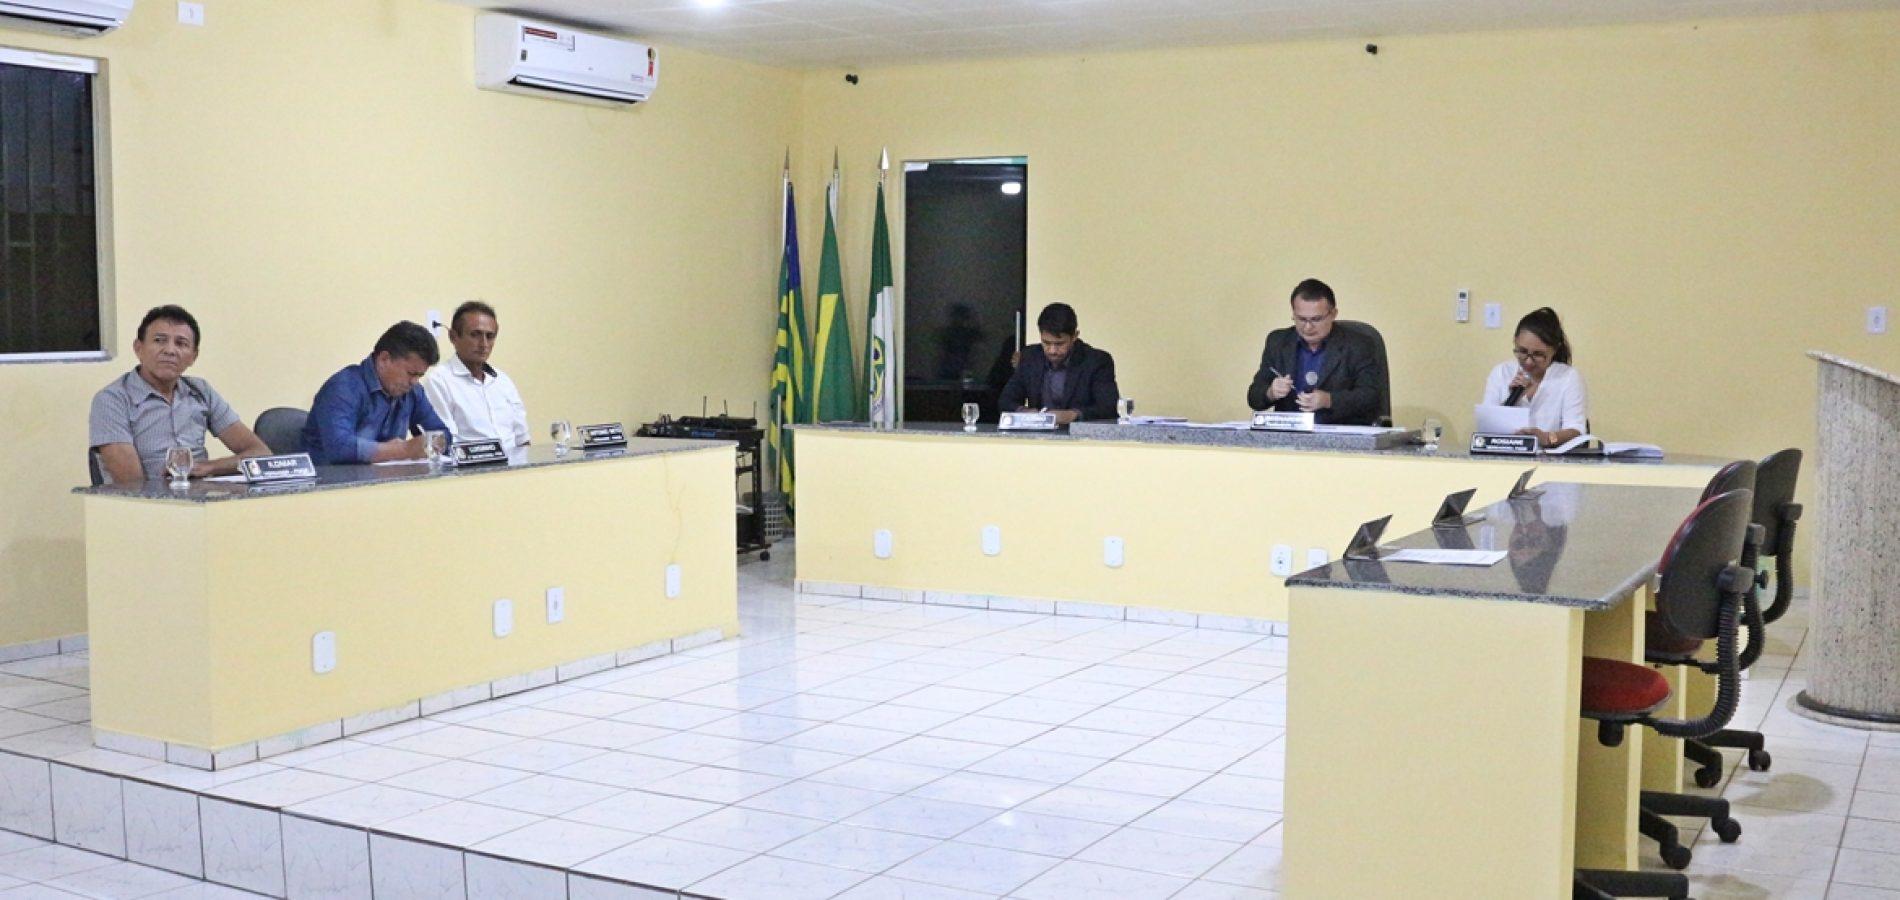 Câmara de Belém do Piauí aprova contas da ex-prefeita Débora e oito Títulos de Cidadania